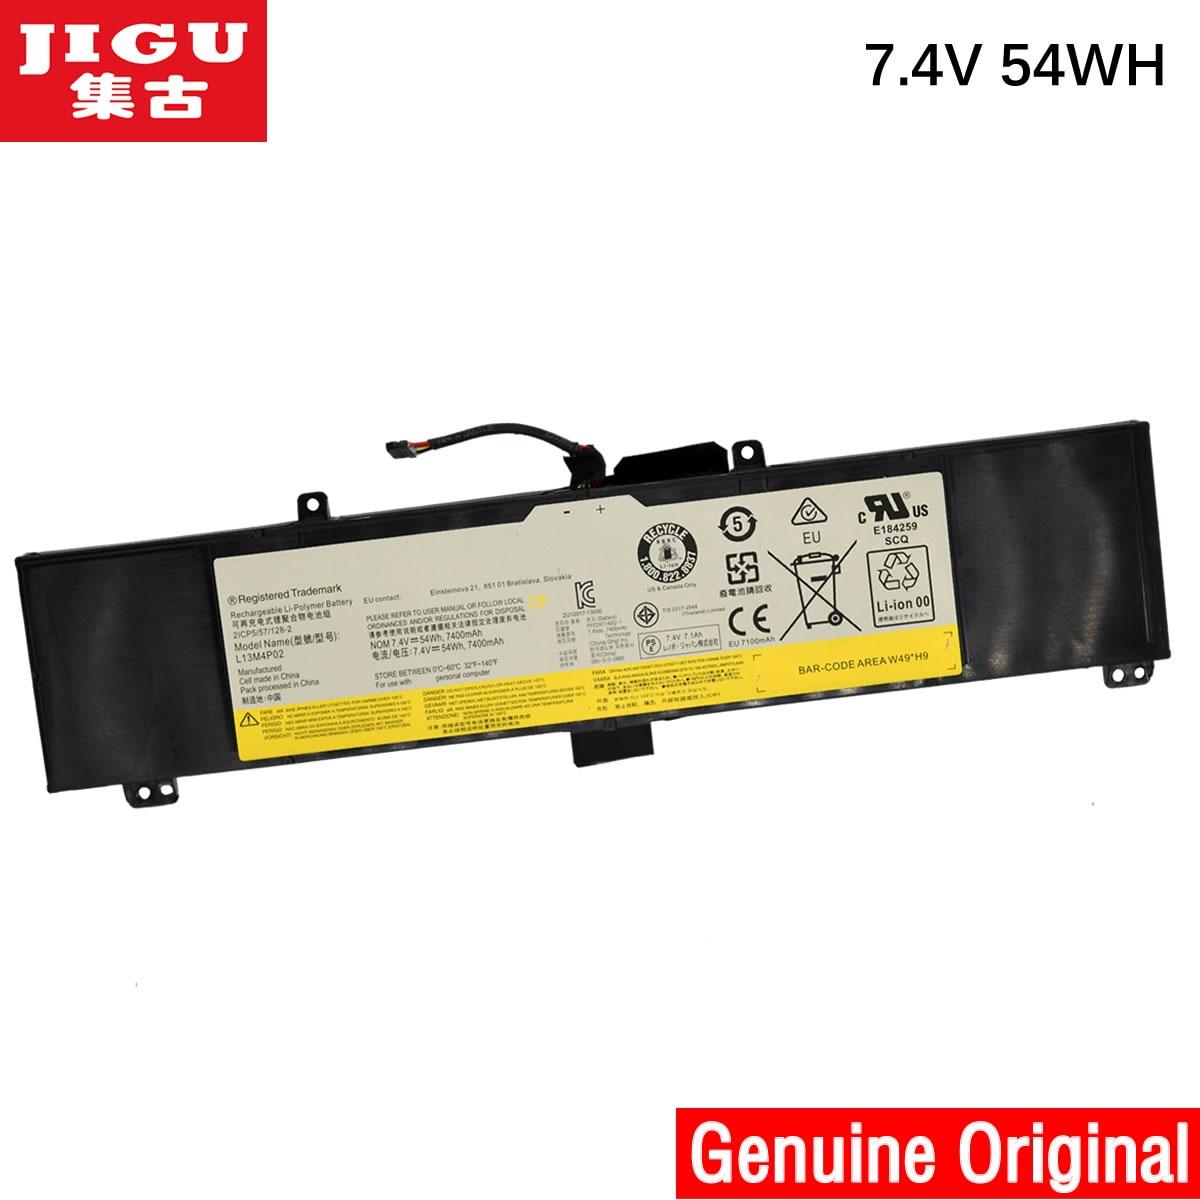 JIGU L13L4P01 L13M4P02 L13N4P01 Original laptop Battery For Lenovo Y50 Y50-70 Y50P Y50-70AM-IFI Y50-70AS-ISE 7.4V 54WH ноутбук lenovo s410 ifi 14